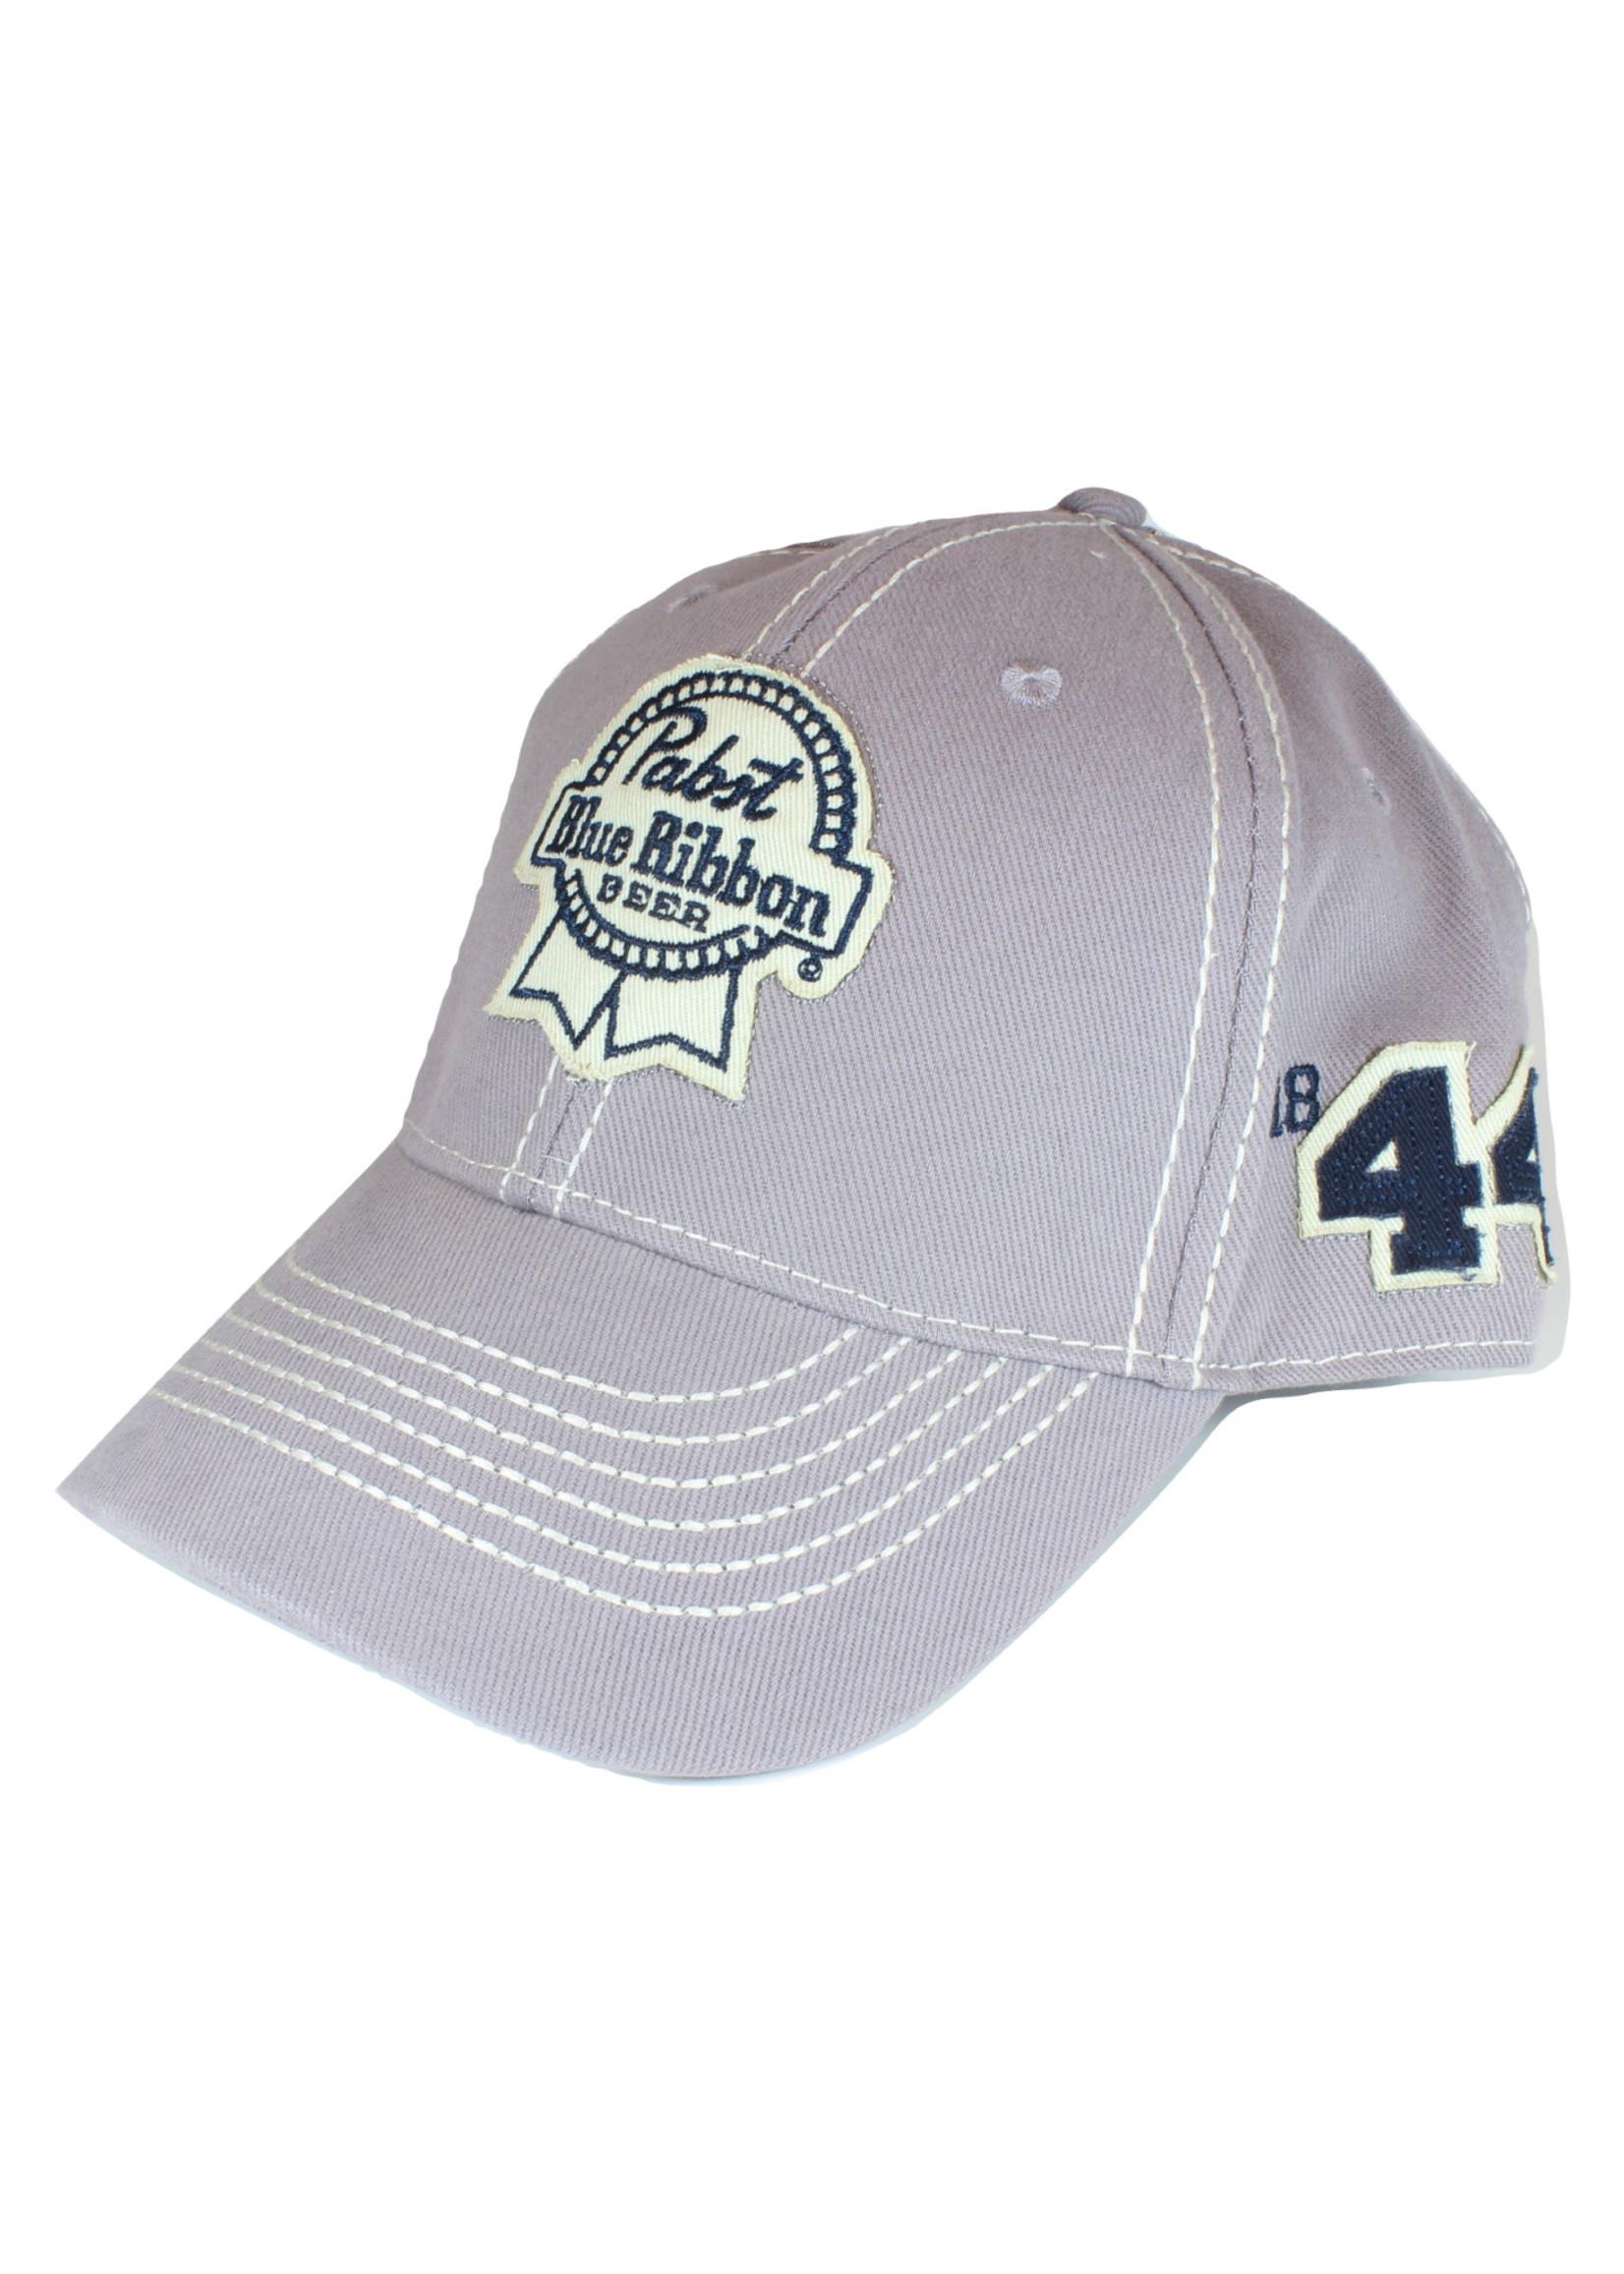 Pabst Pabst 1844 Grey Cap